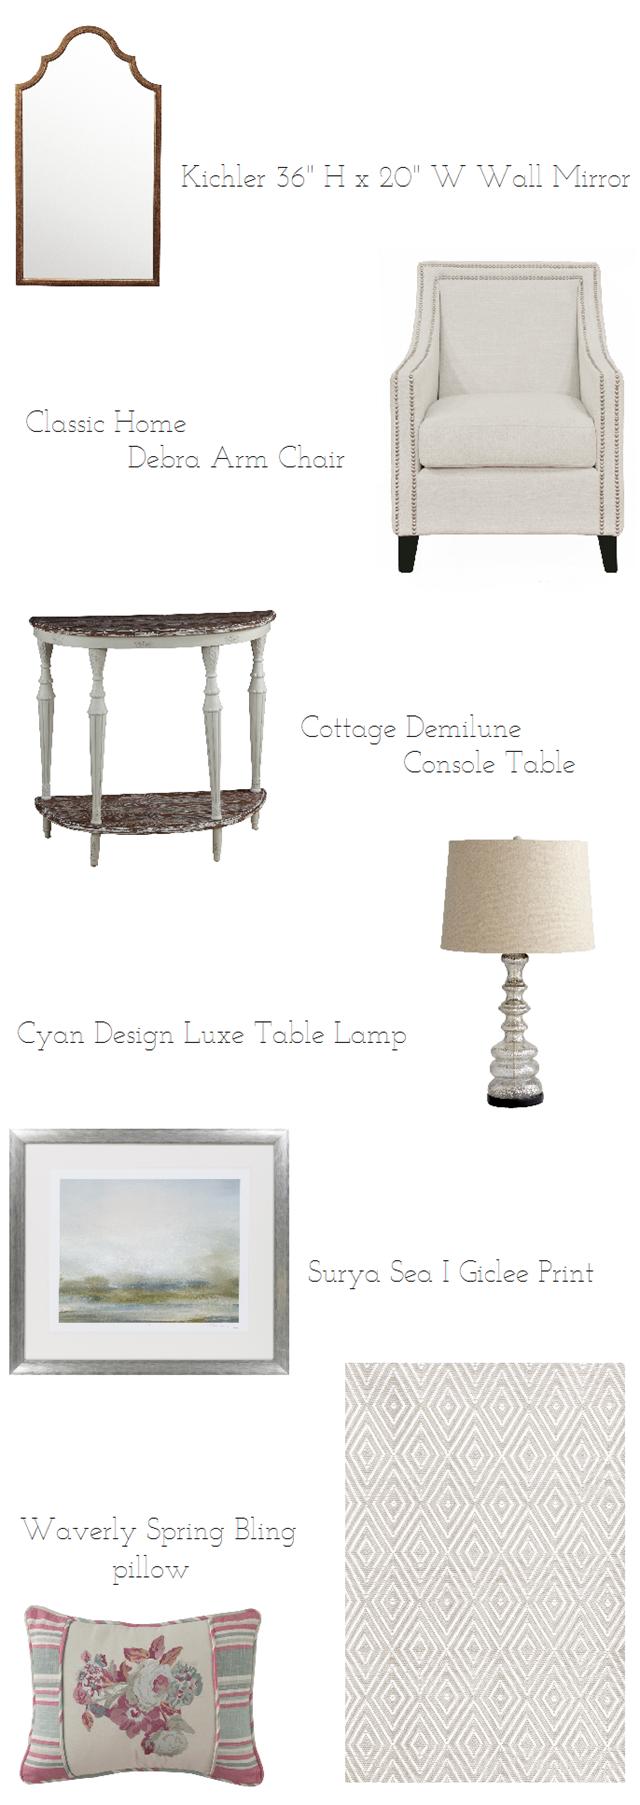 wayfair-living-room